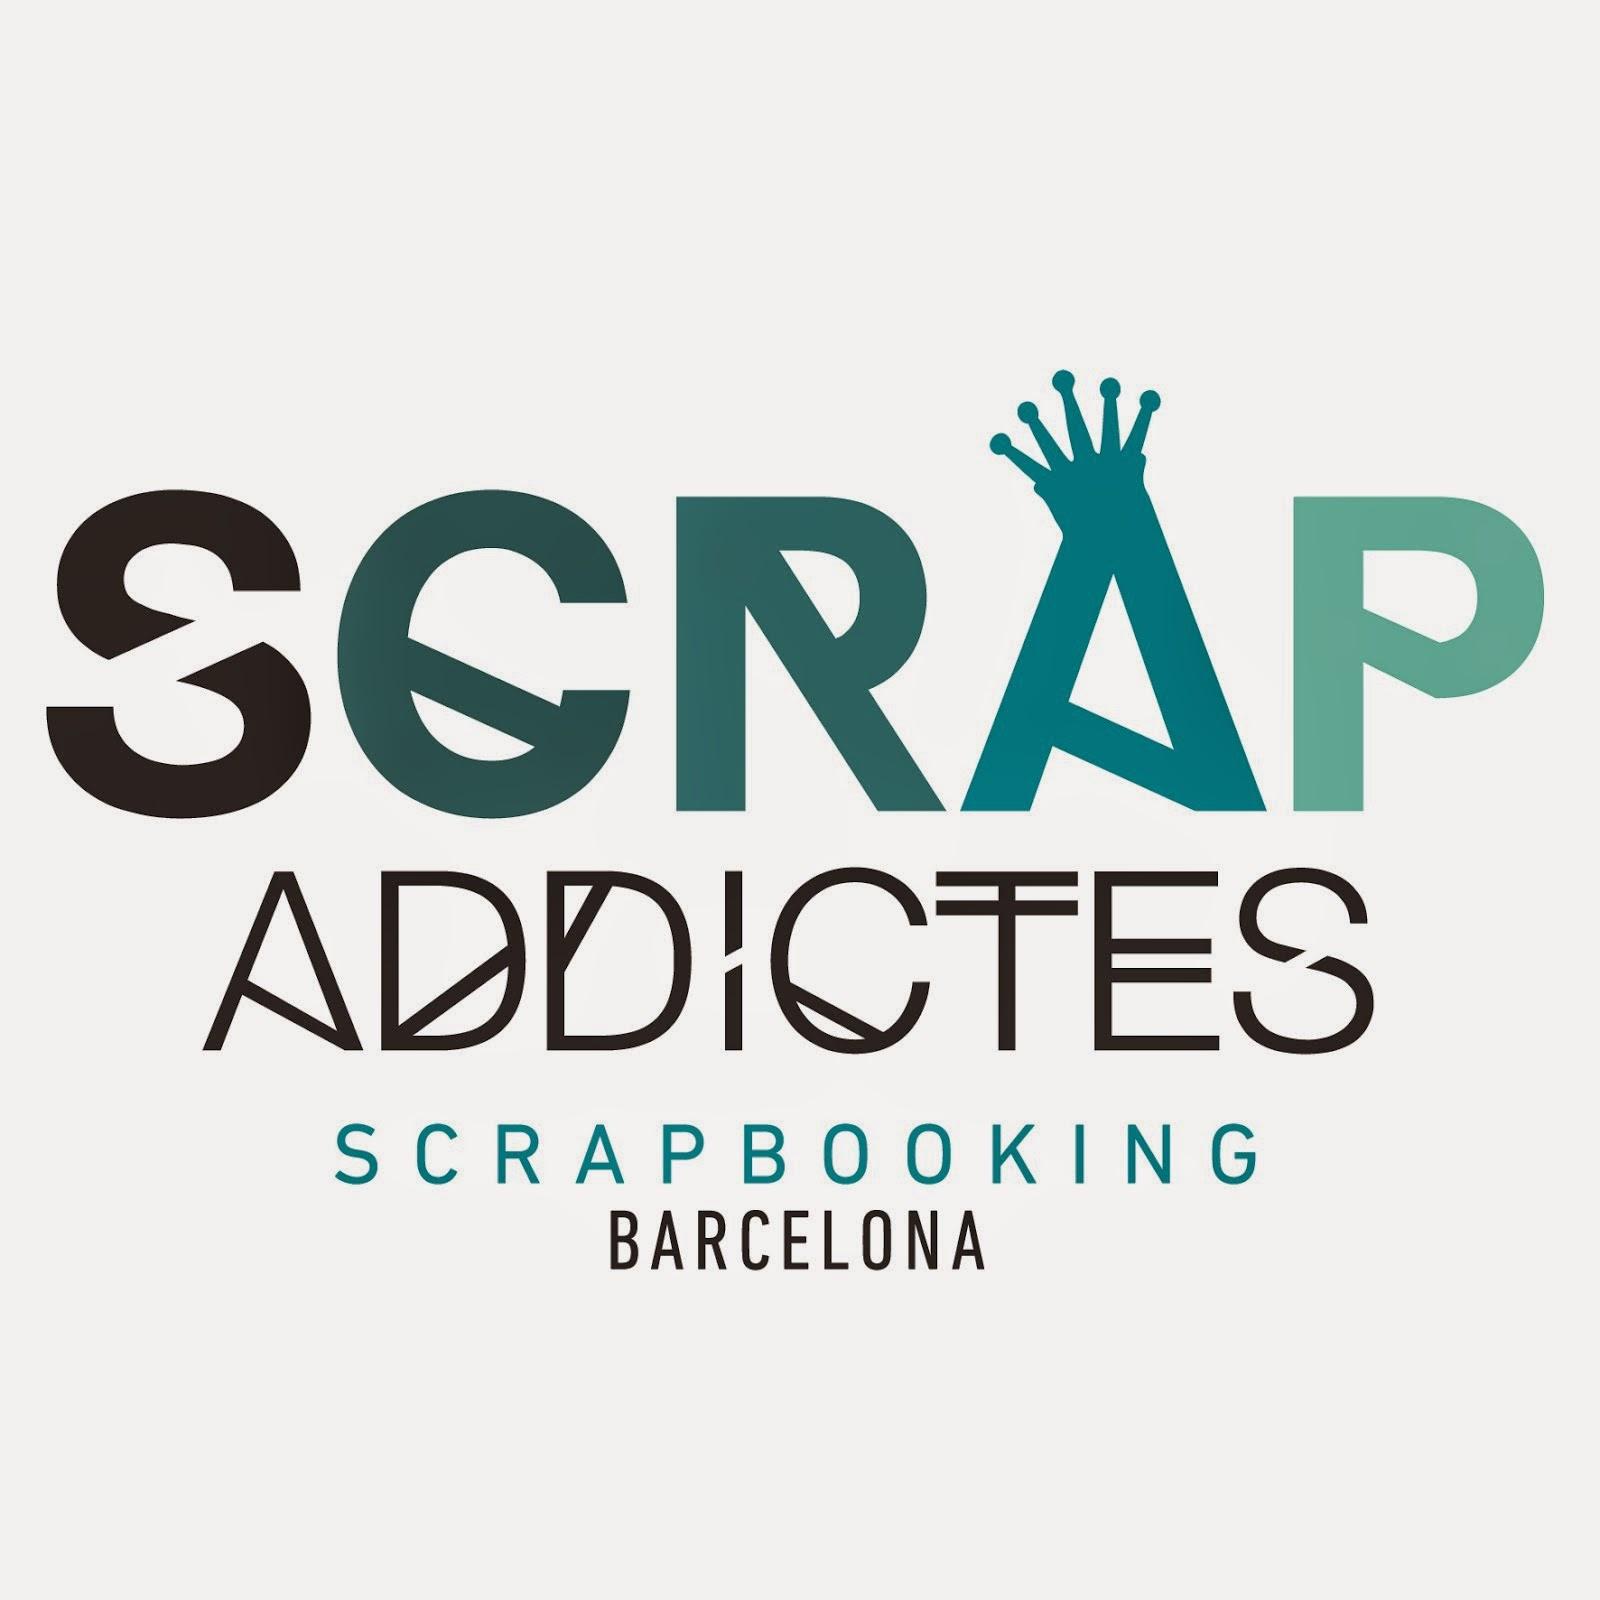 Scrapaddictes